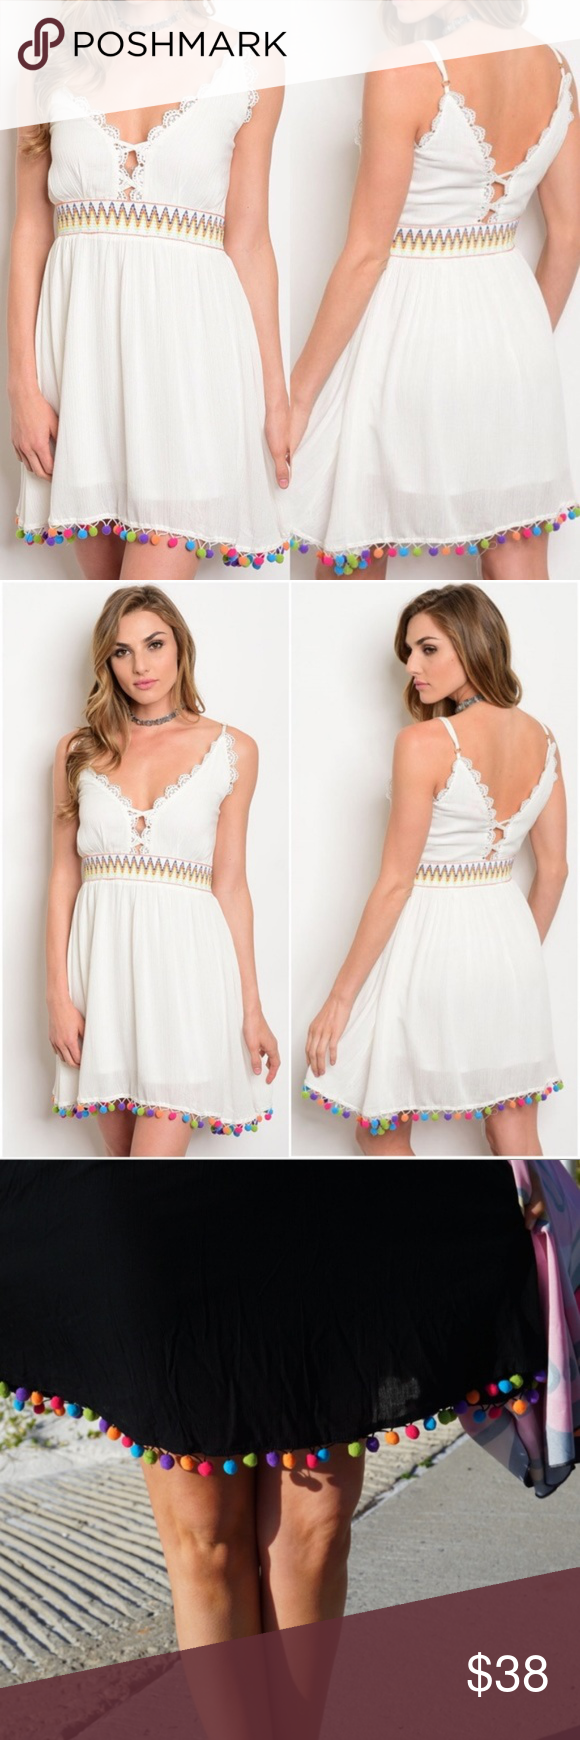 73e1862fa0 ... Pom Poms Dress - White Boutique Item: Sassy & Sexy Little White Dress  with Multi-Colored Pom Pom embellishments at the bottom of the dress. - V- Neck ...